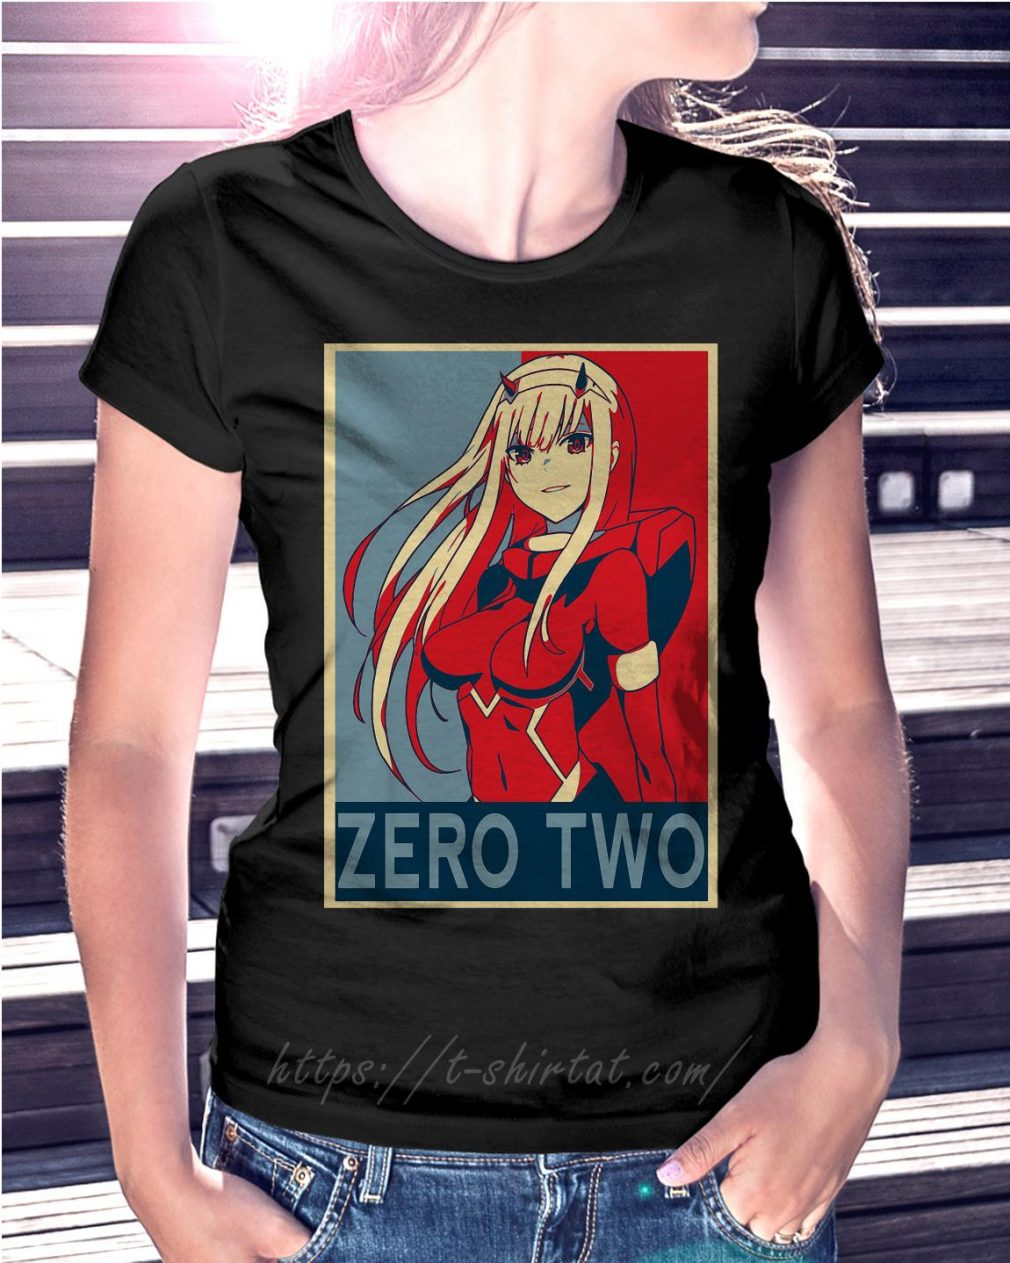 Darling in the Franxx Zero Two